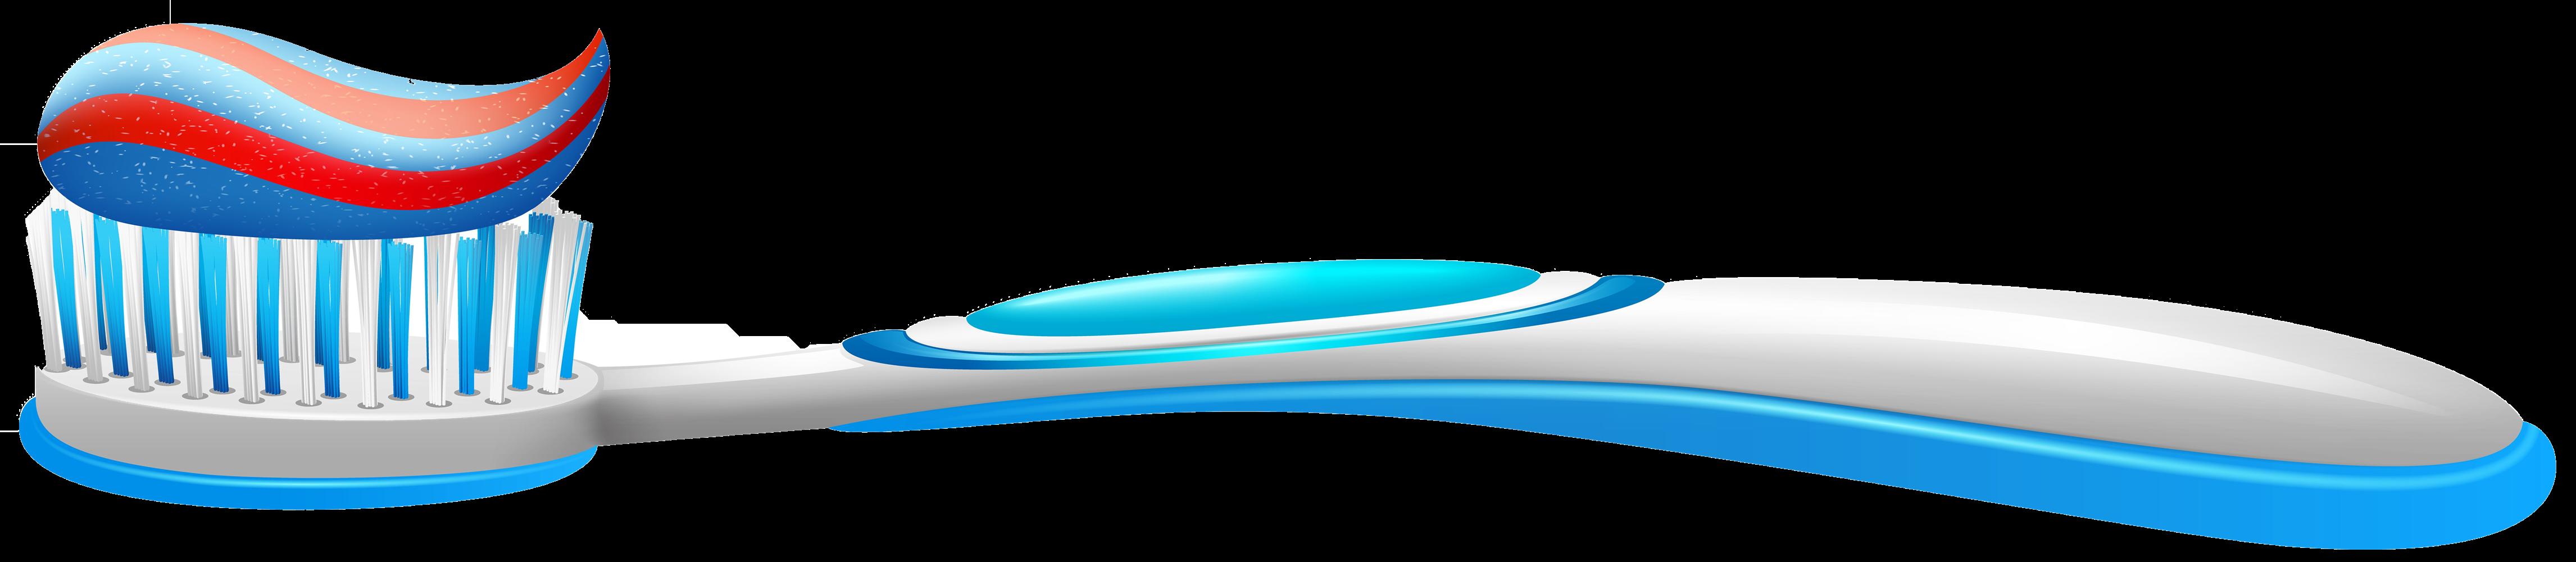 Зубная щётка PNG